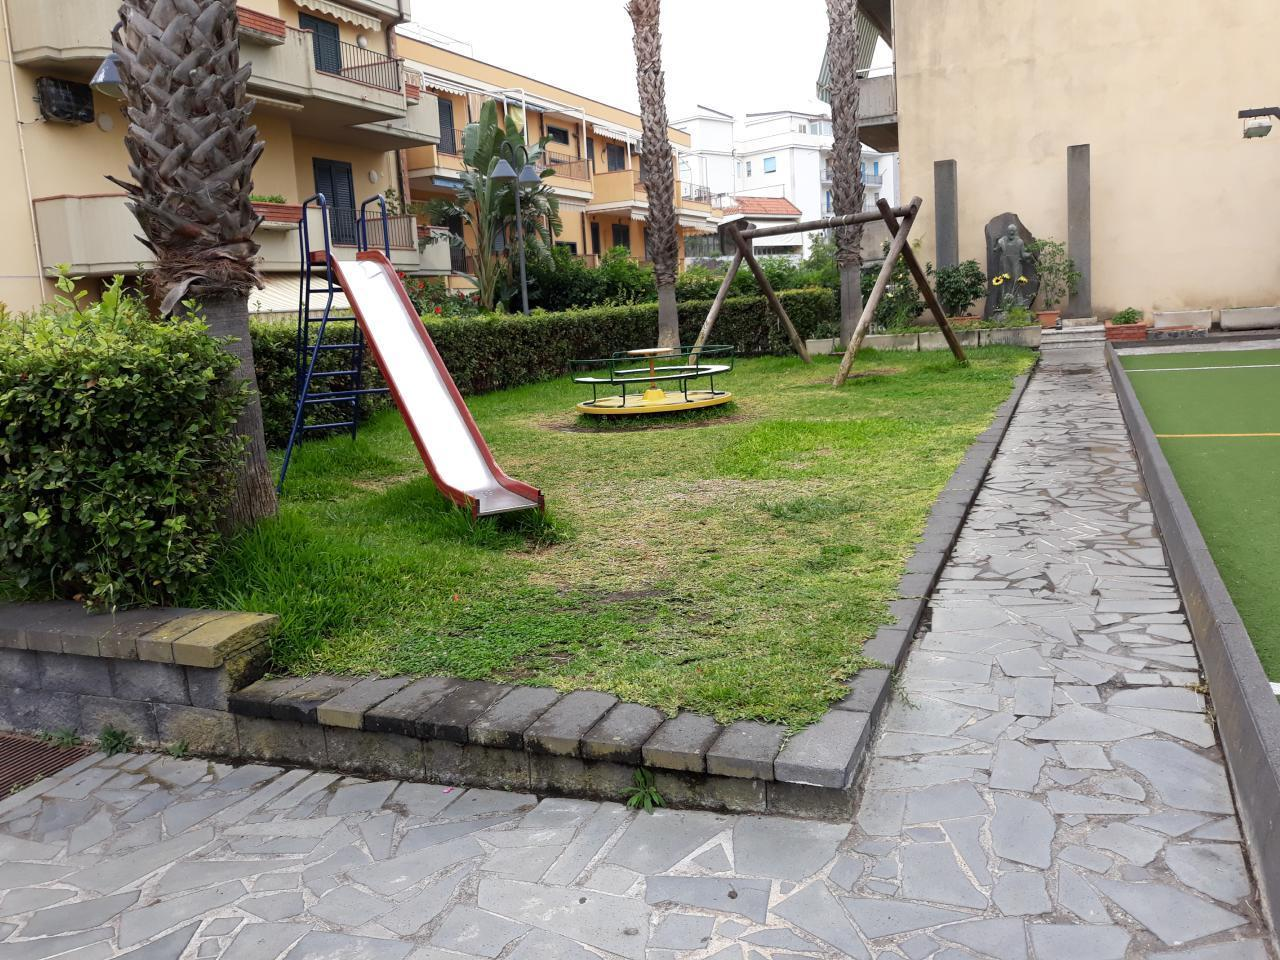 Appartement de vacances MARE - ETNA - TAORMINA (2618228), Mascali, Catania, Sicile, Italie, image 7